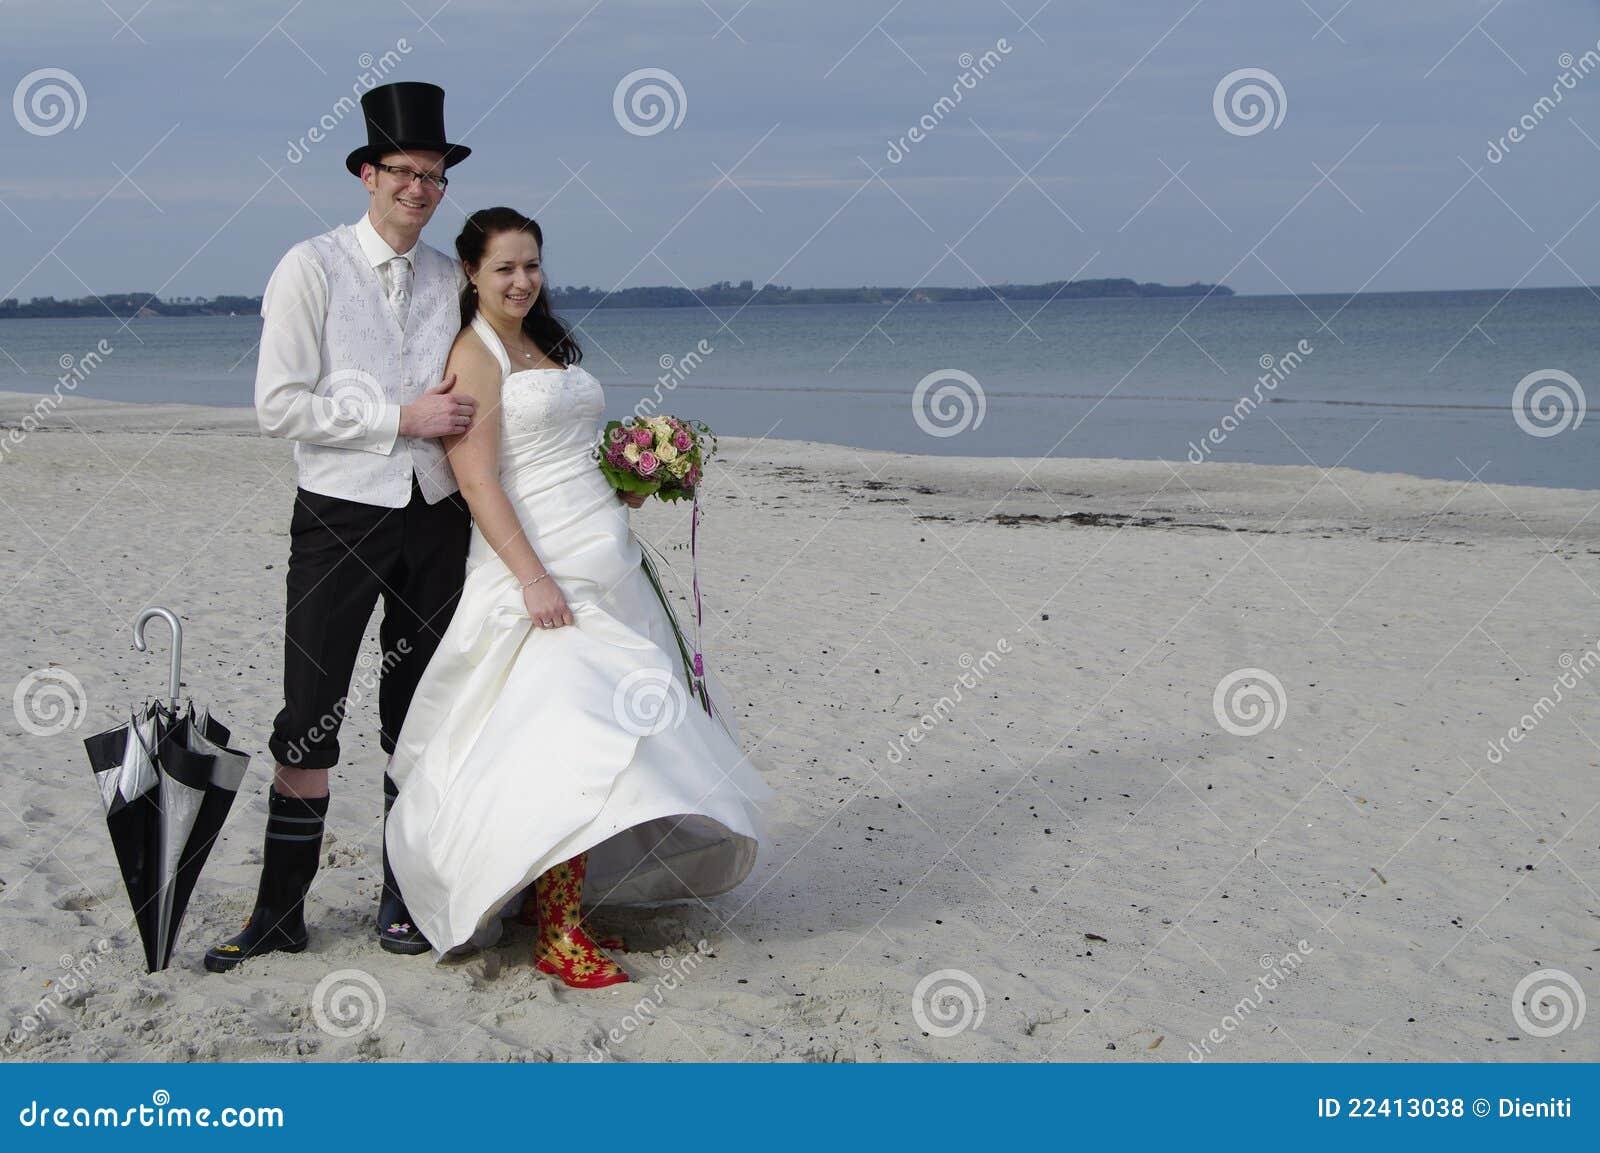 Funny Wedding At The Beach Royalty Free Stock Photos